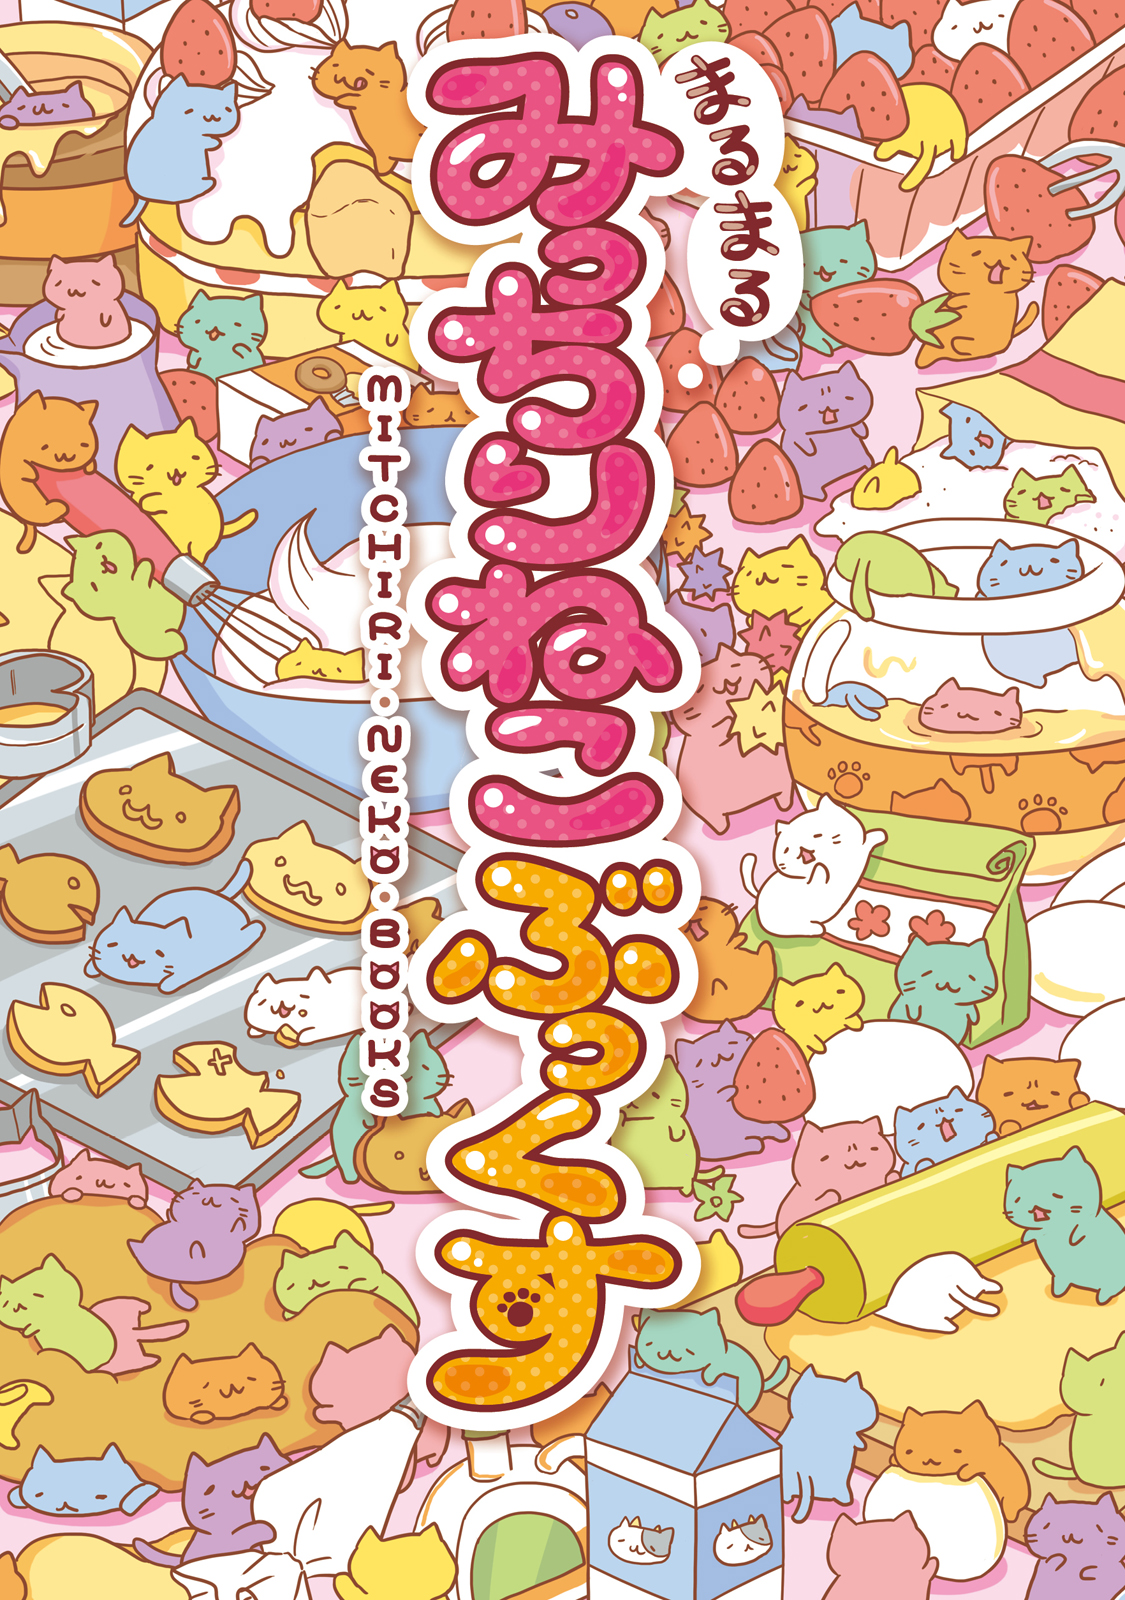 imagetwist com .yukikax .: jptrans.naver.net/j2j.php/korean/img.jpg4.info/.imagetwist+com+...